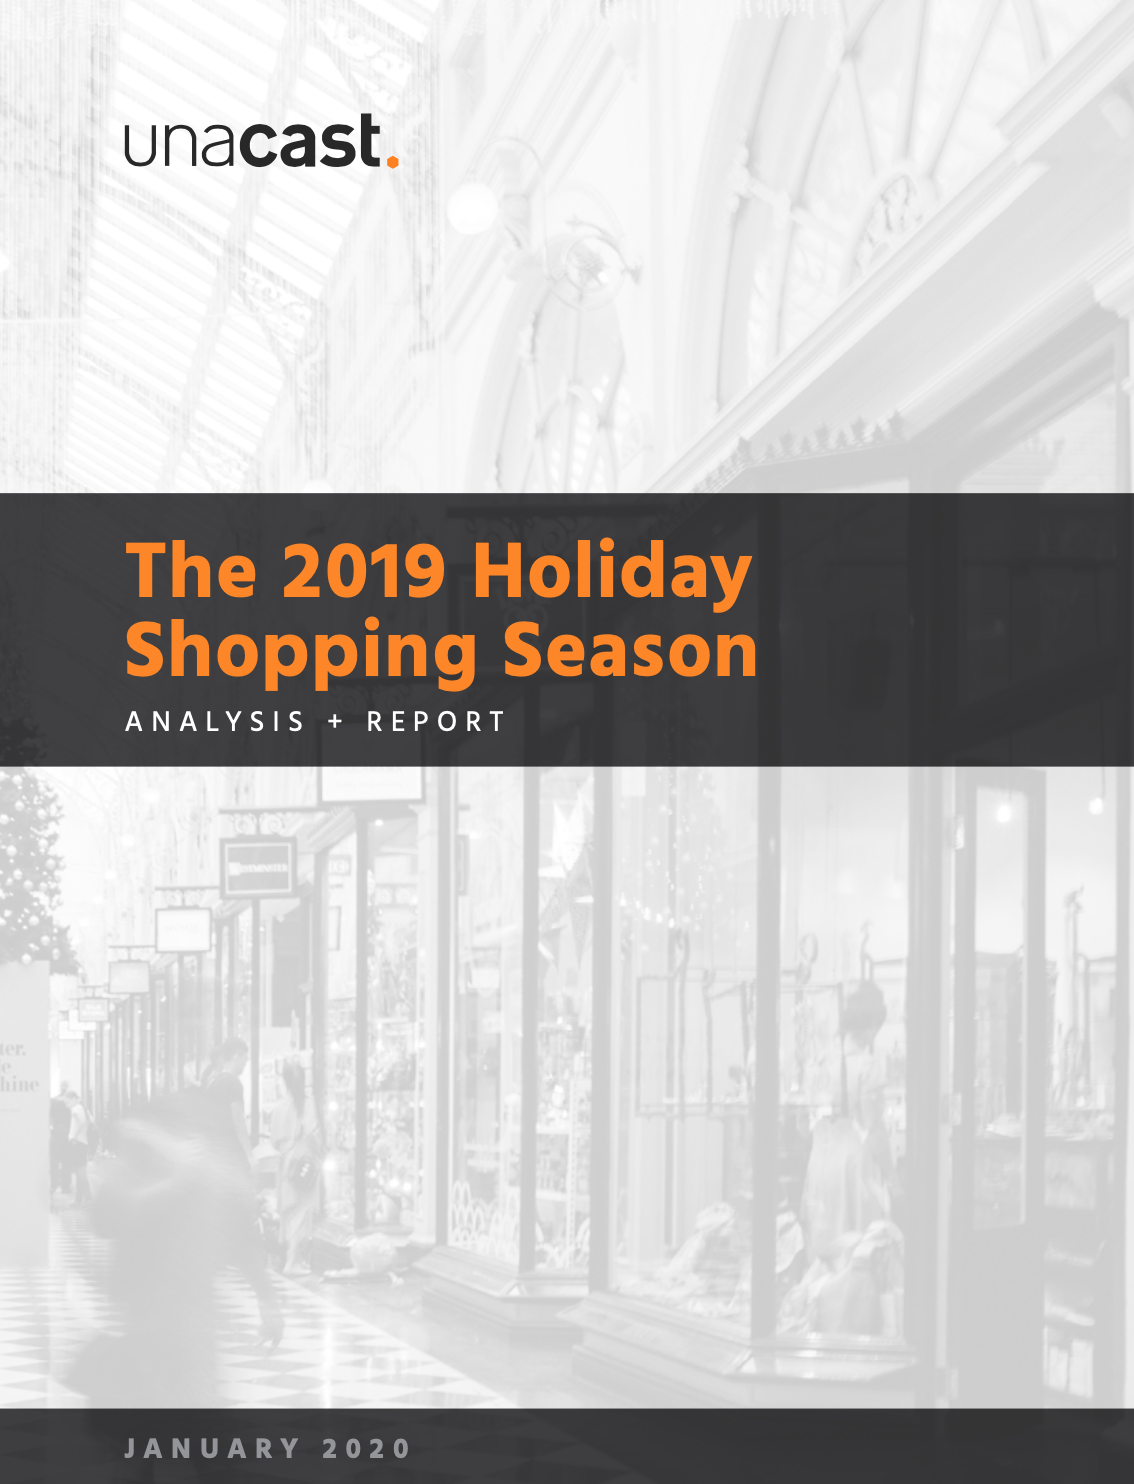 2019 Holiday Shopping Season Analysis and Report